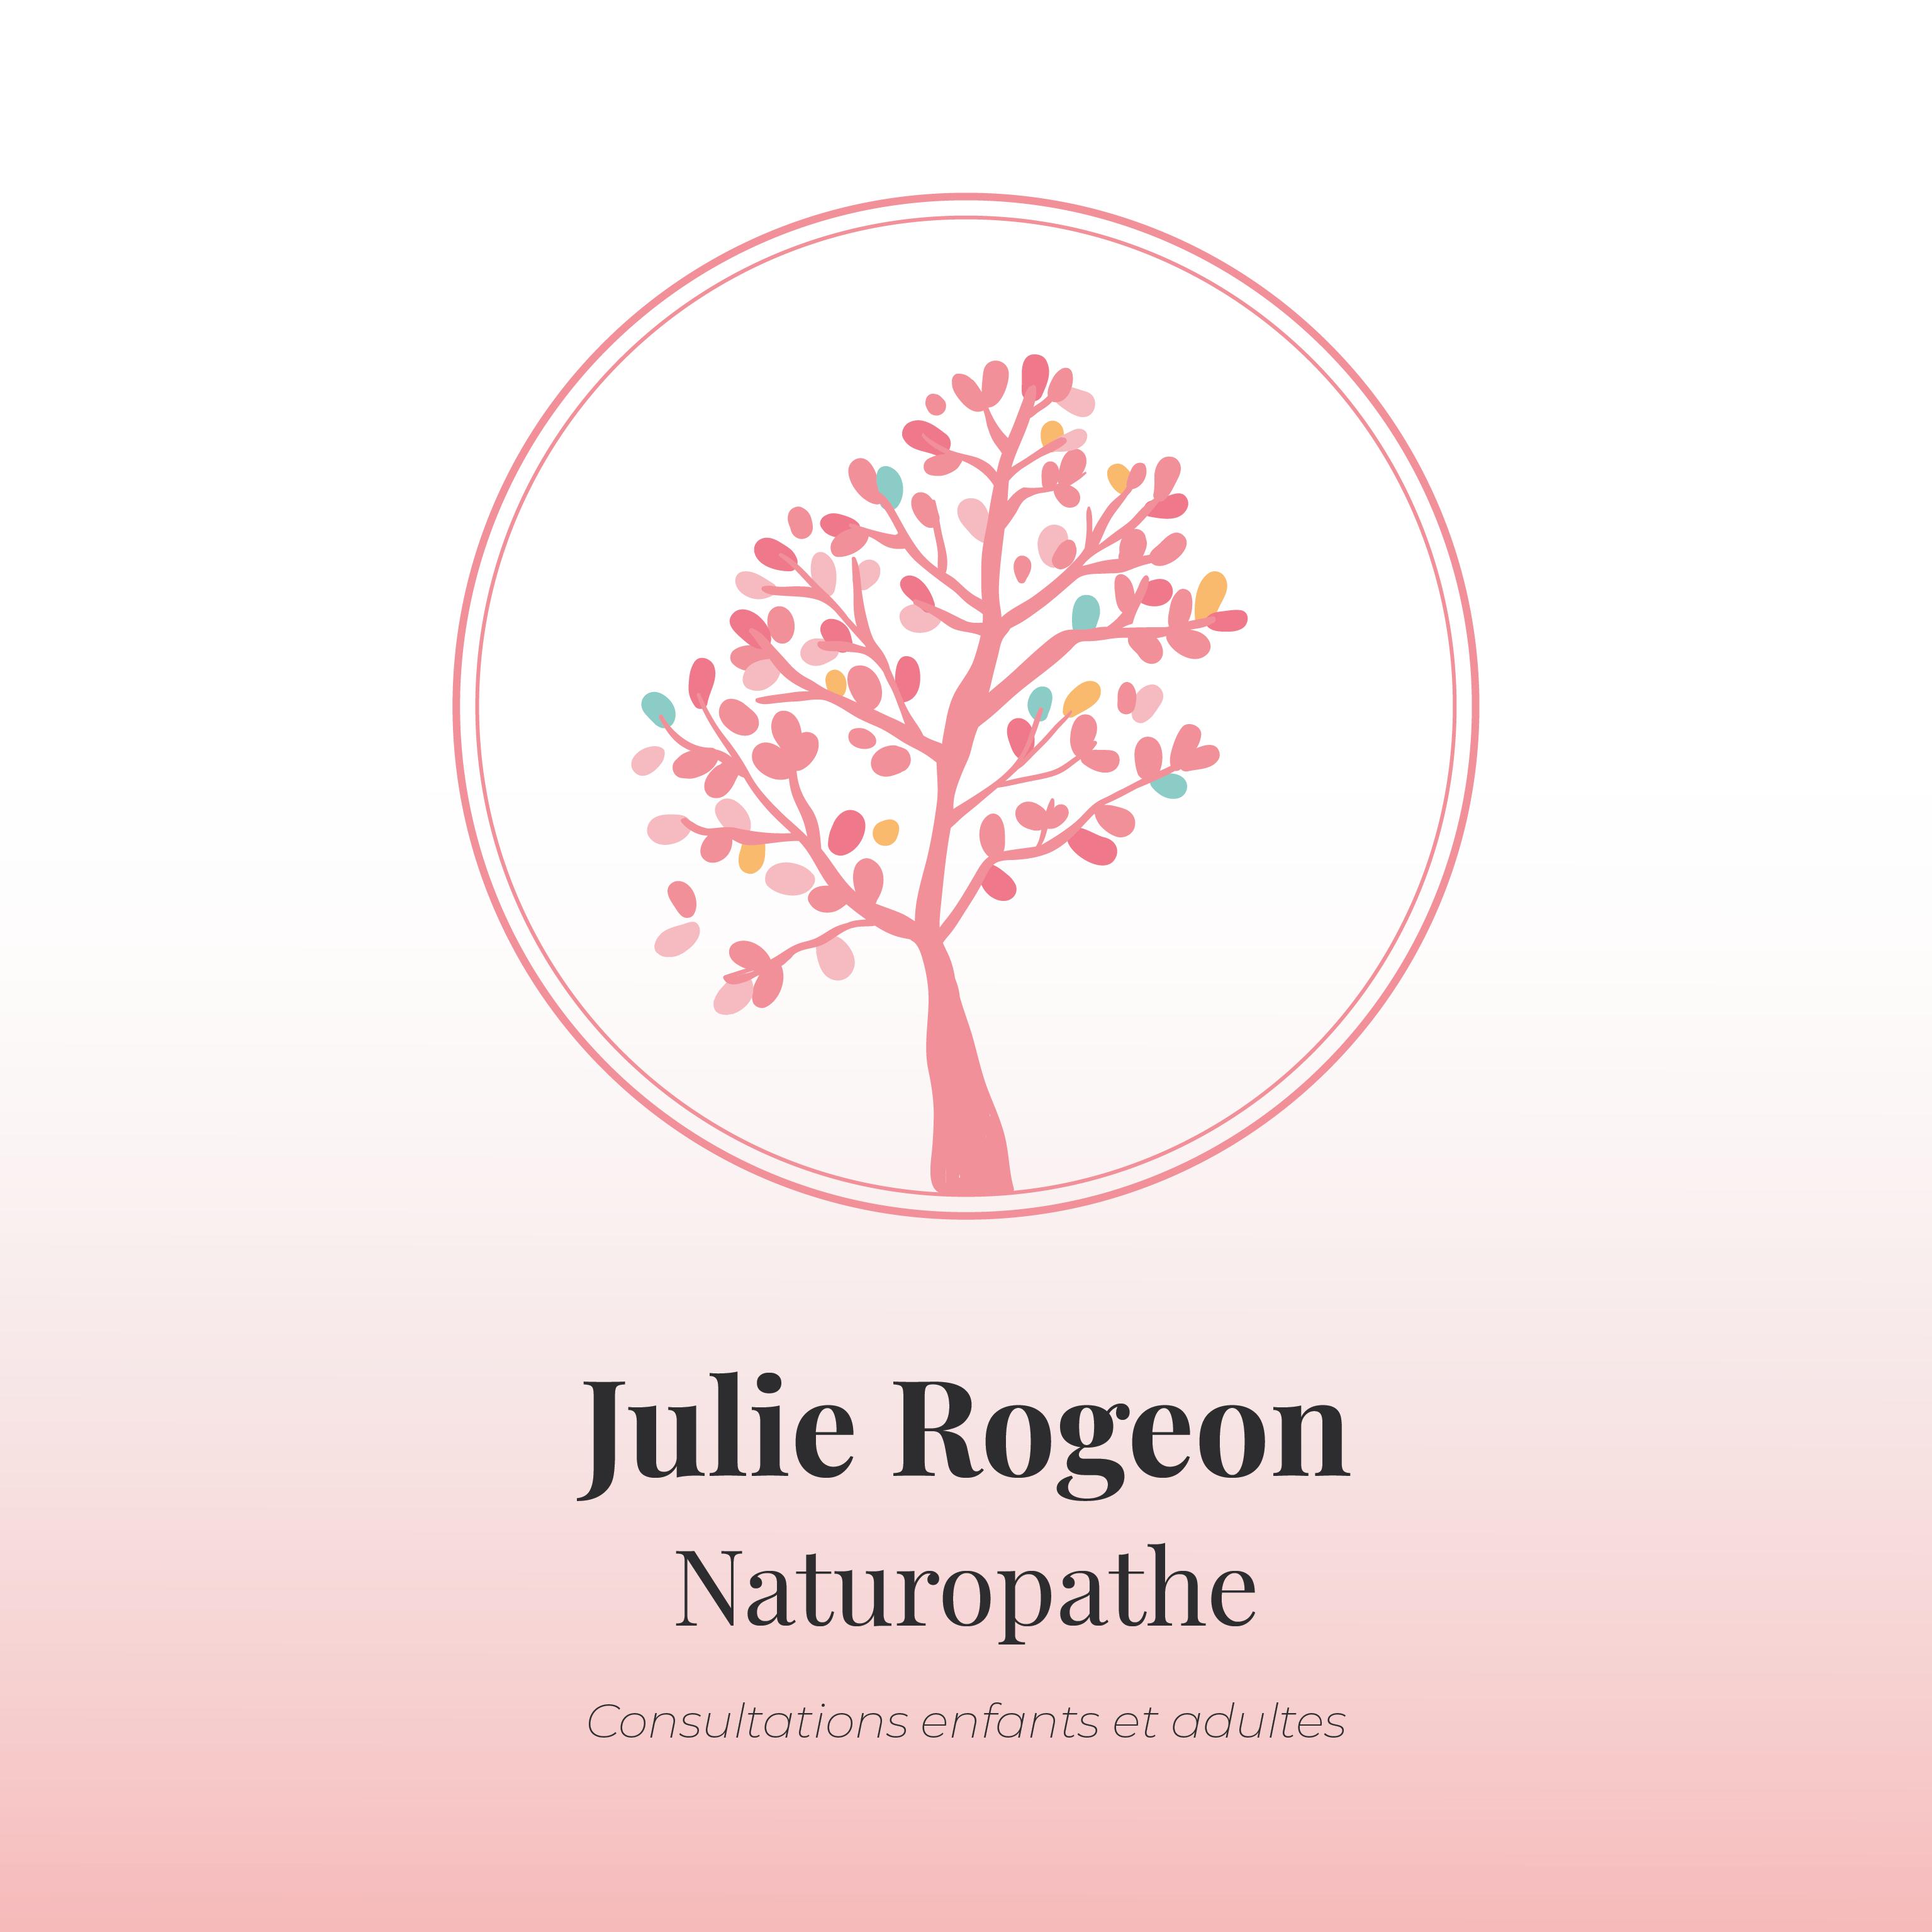 Julie Rogeon : Carte de visite - Recto